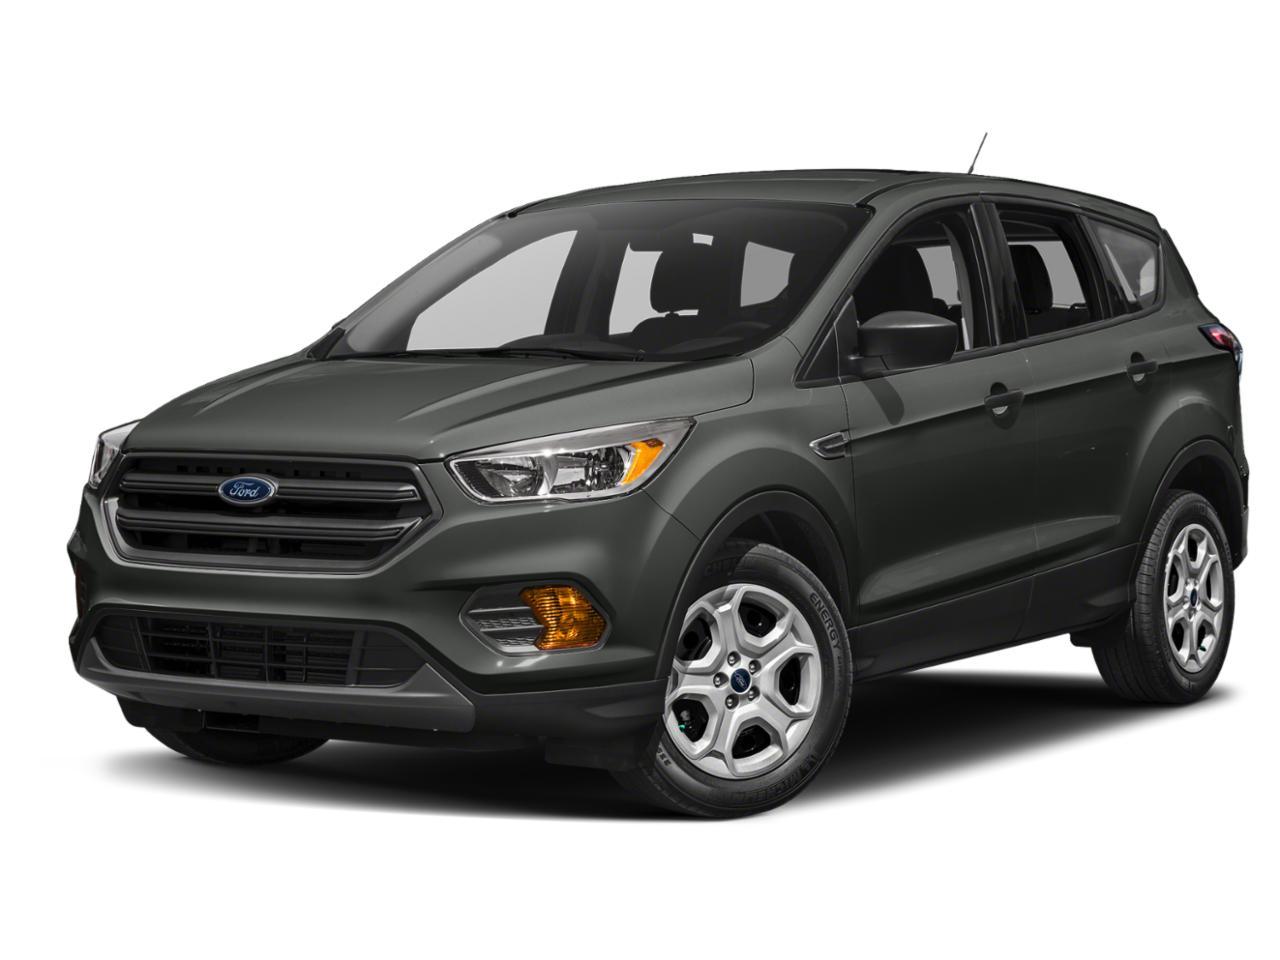 2019 Ford Escape Vehicle Photo in San Antonio, TX 78238